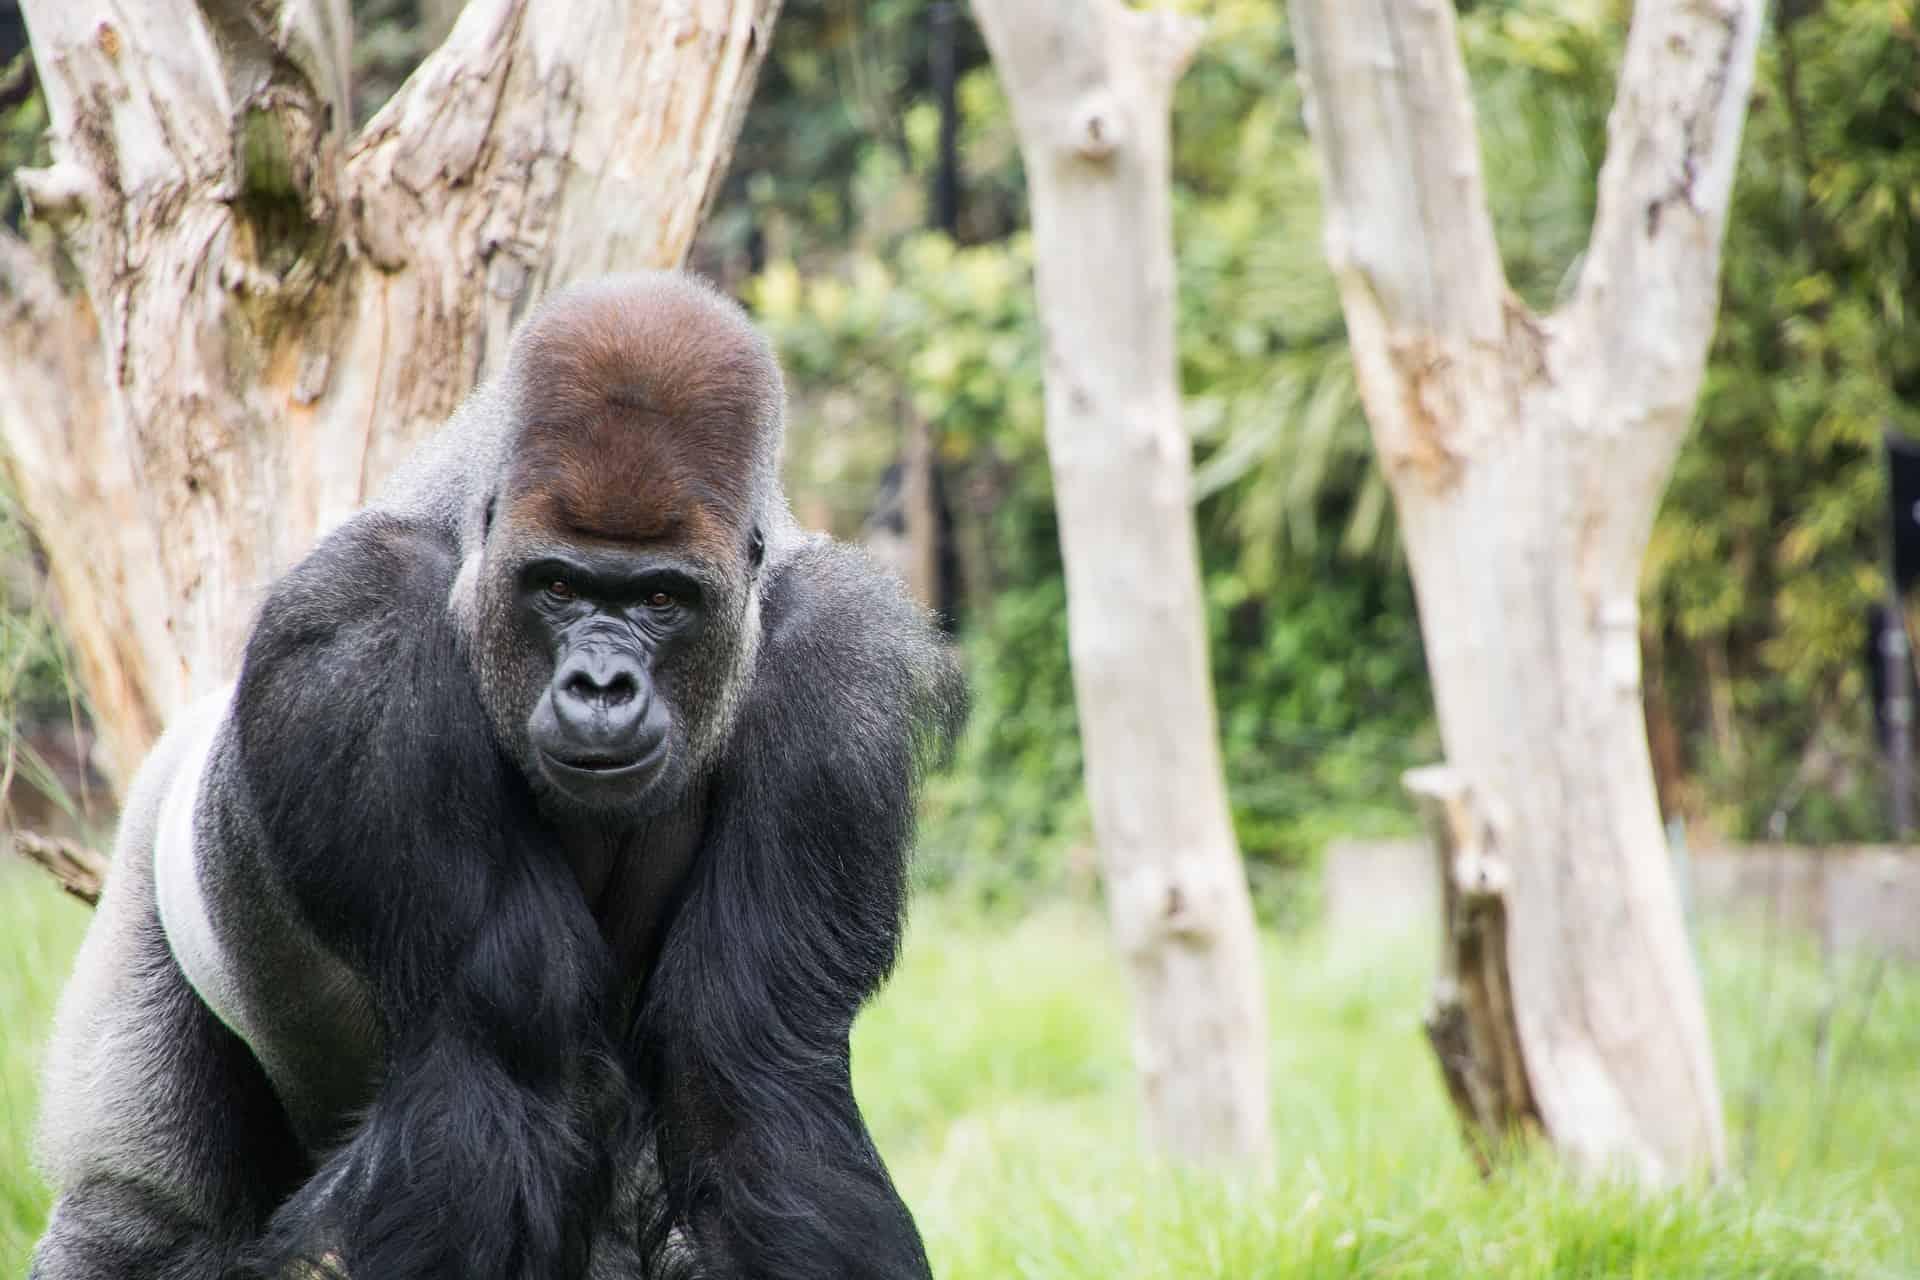 Londoner Zoo der älteste der Welt - jetzt 10% Rabatt erhalten